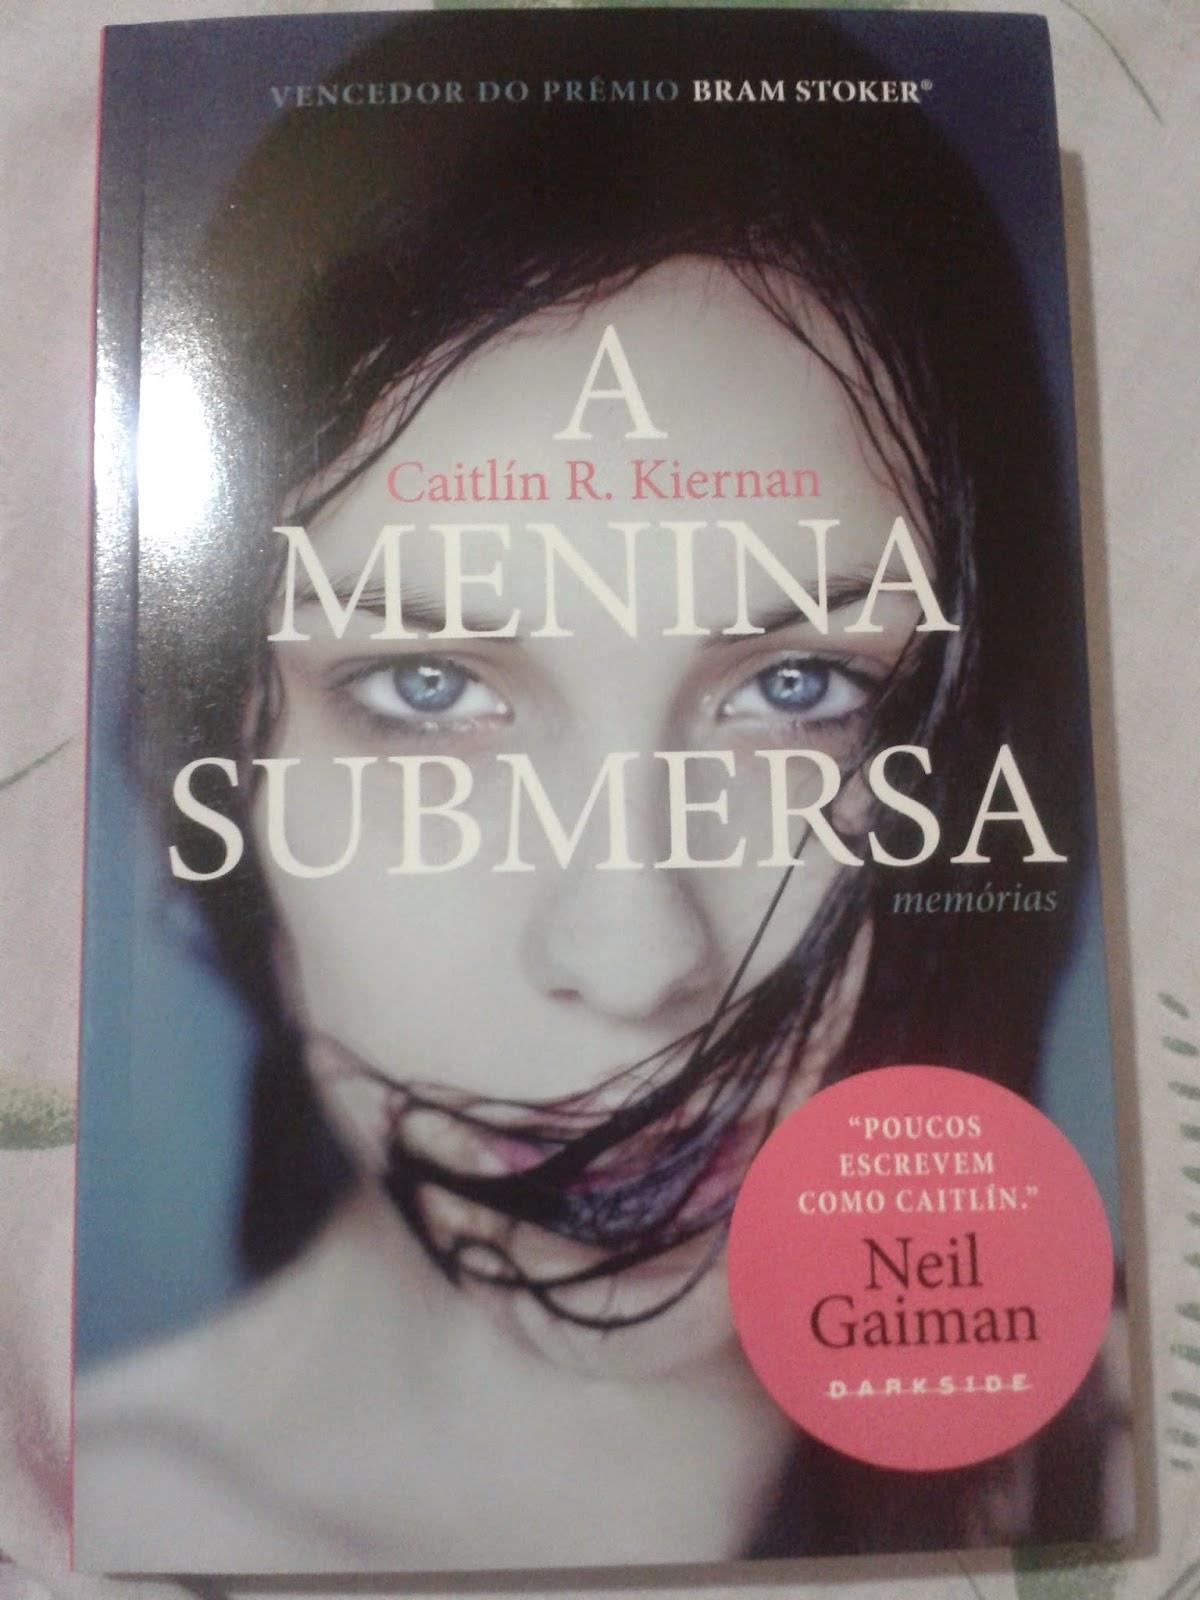 A Menina Submersa - DarkSide Books